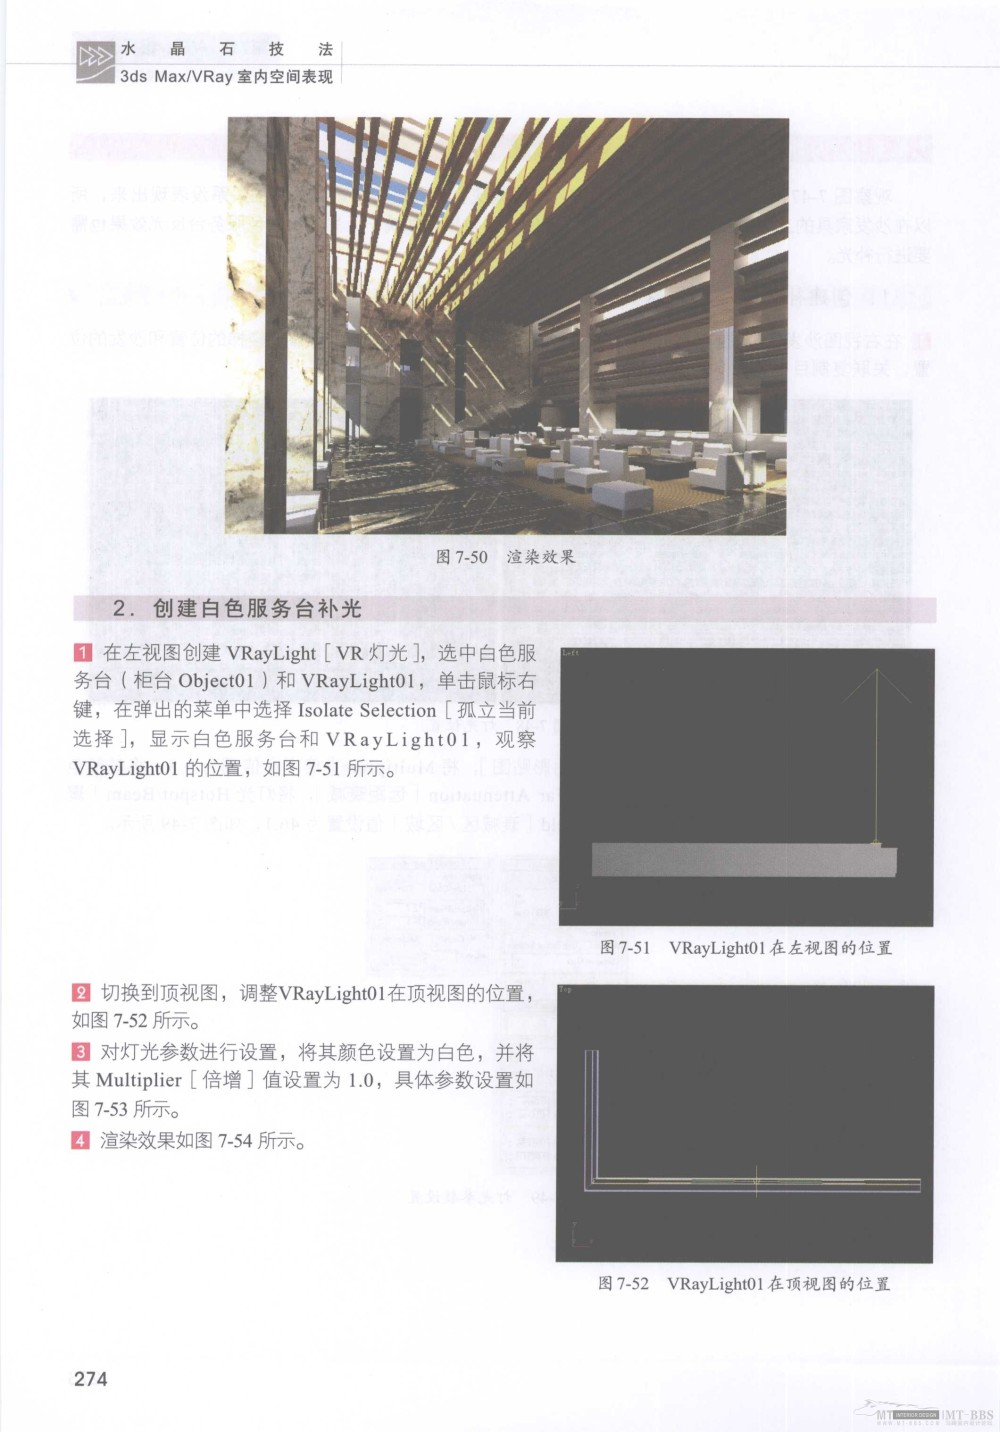 水晶石技法-3ds_Max&VRay室内空间表现_水晶石技法-3ds_Max&VRay室内空间表现_页面_280.jpg